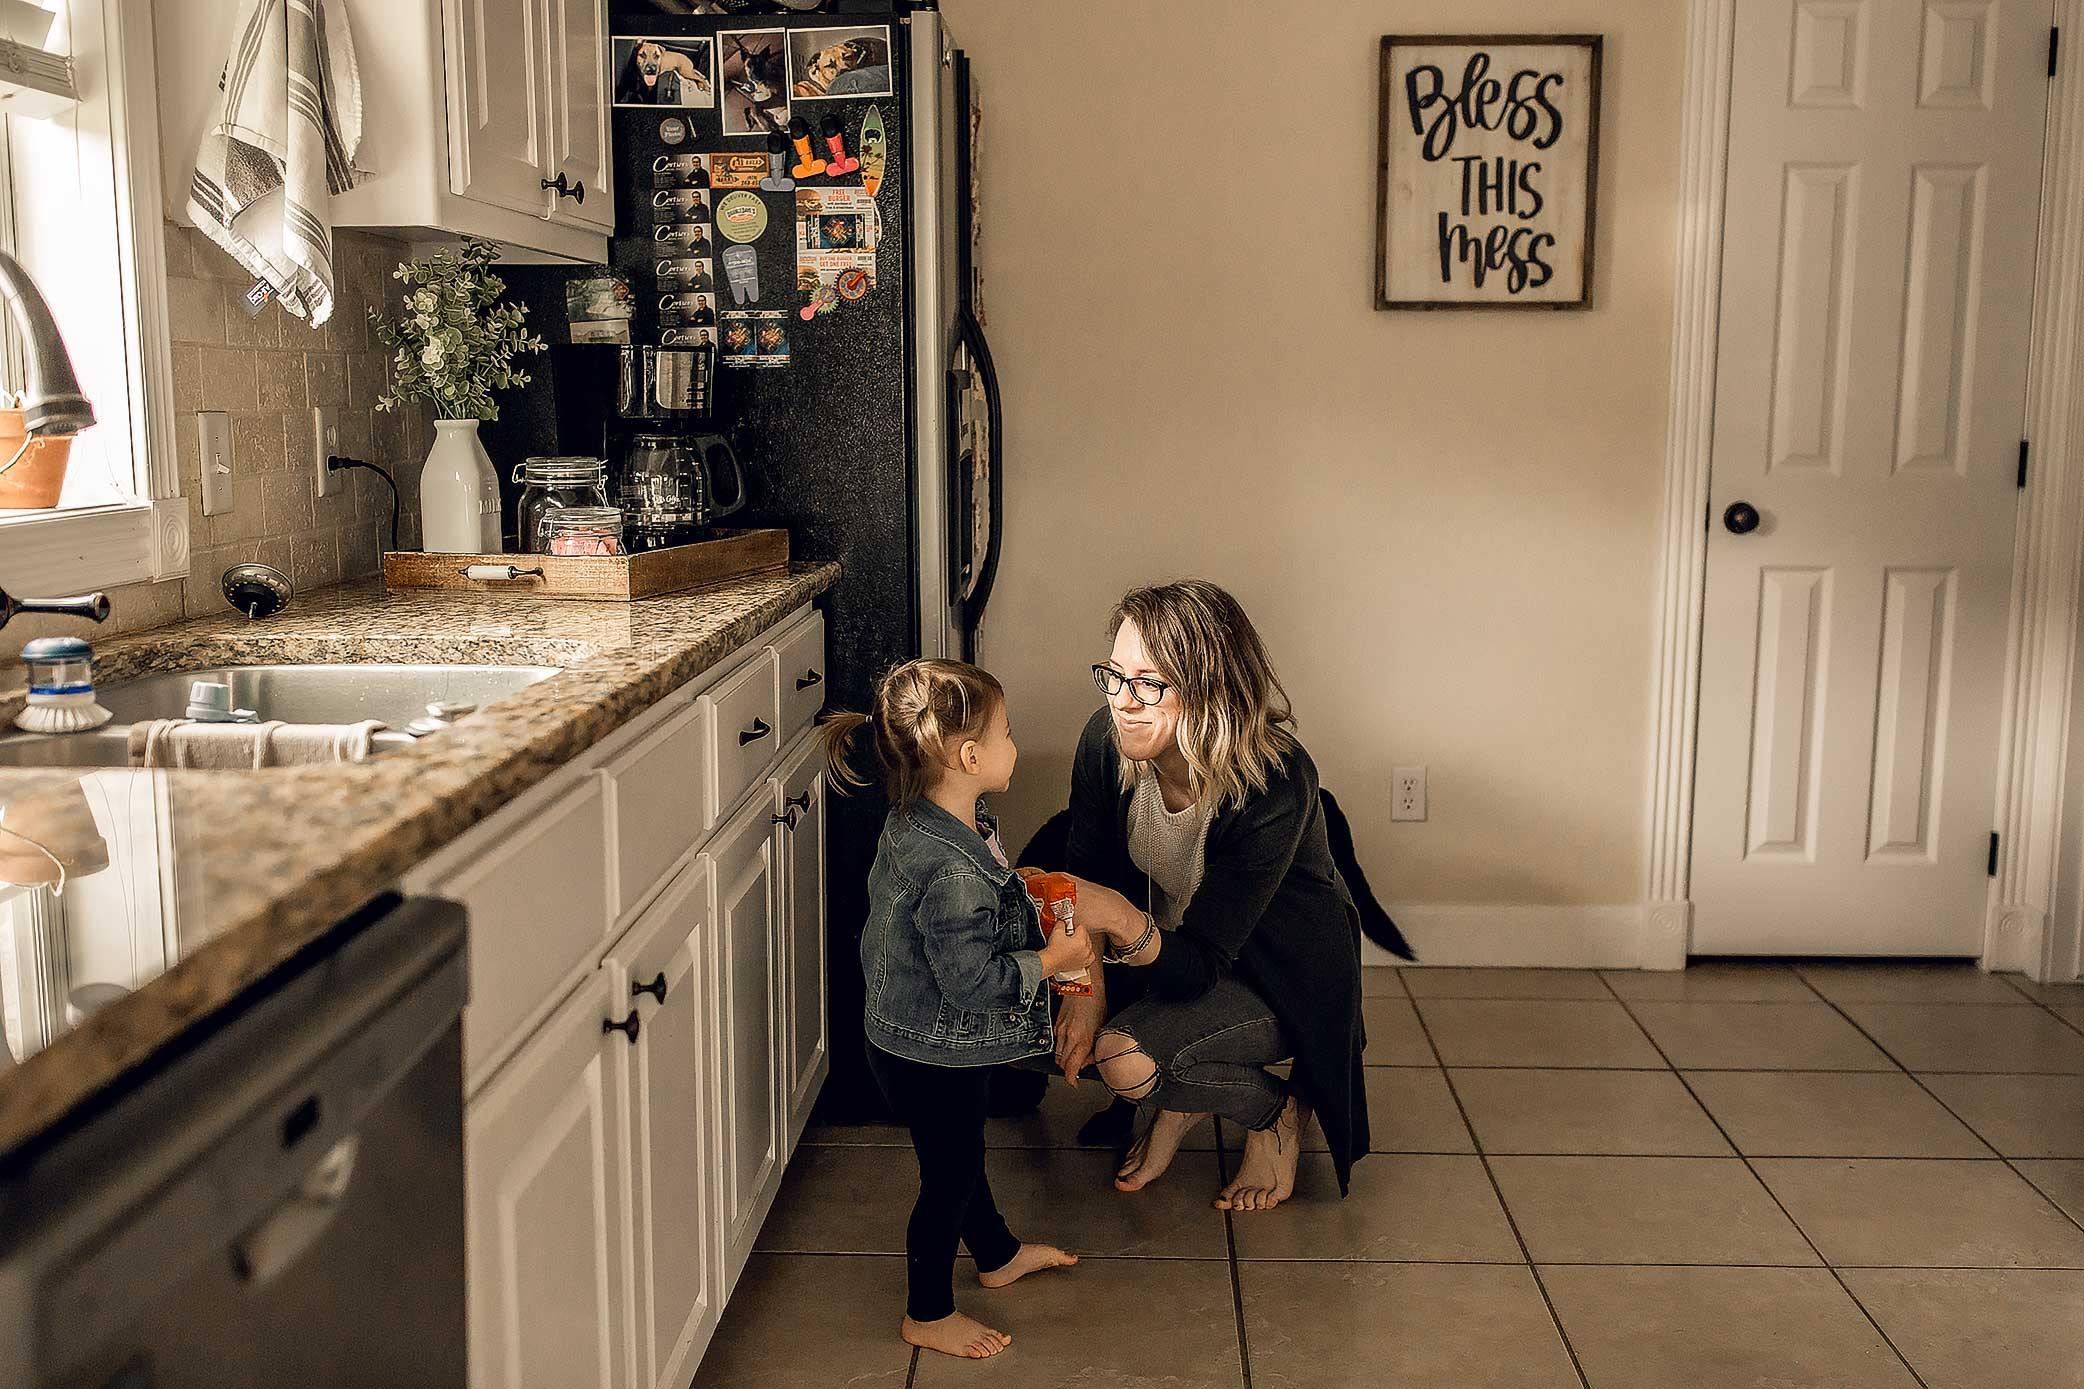 shelby-schiller-photography-self-portrait-in-kitchen.jpg